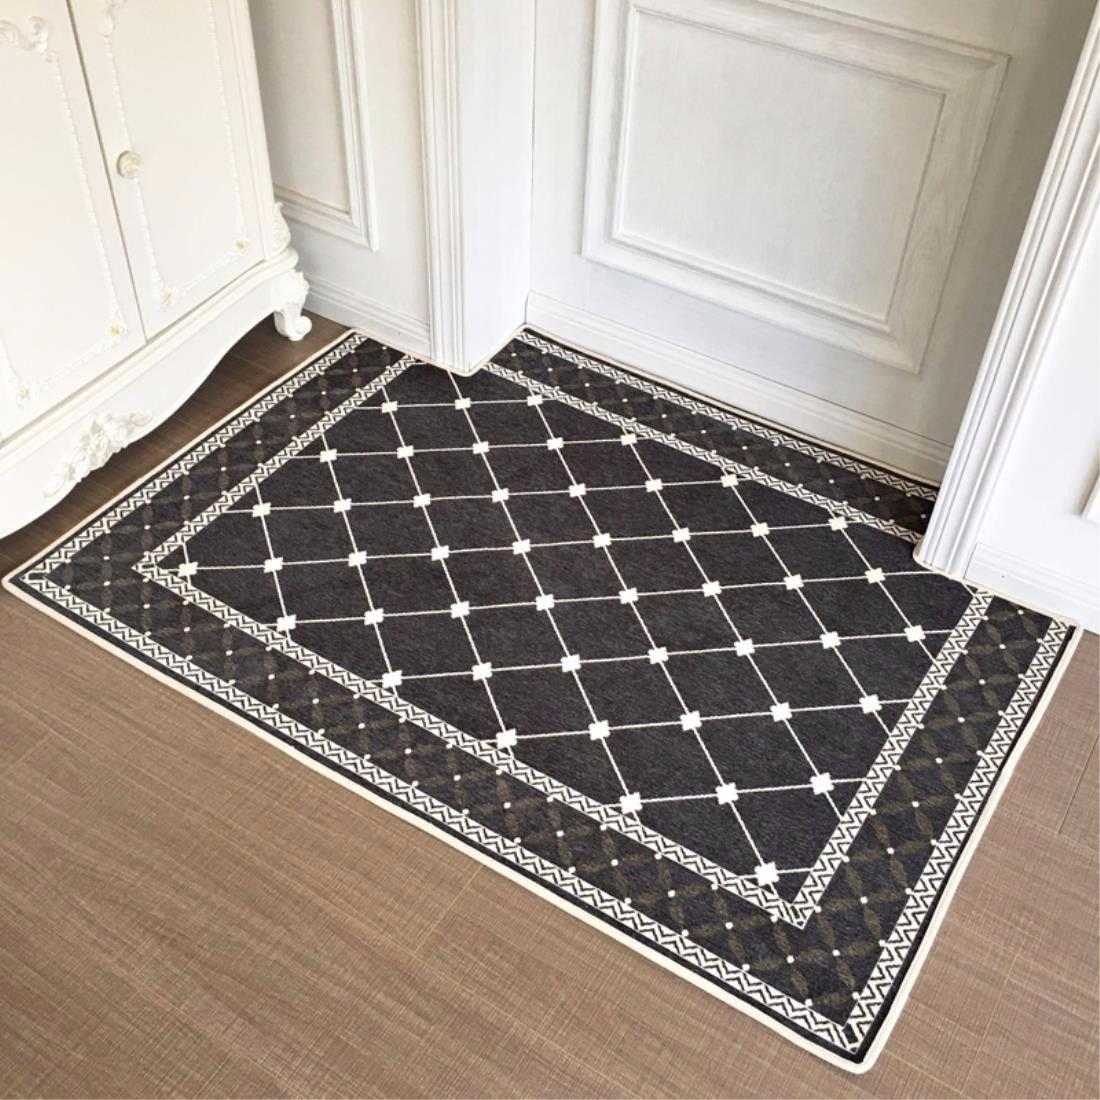 LIUXINDA-DT Household modern carpet, doorway carpet, lobby carpet, living room carpet, bedroom carpet, antiskid carpet,5080CM (19.631.4) in,gray